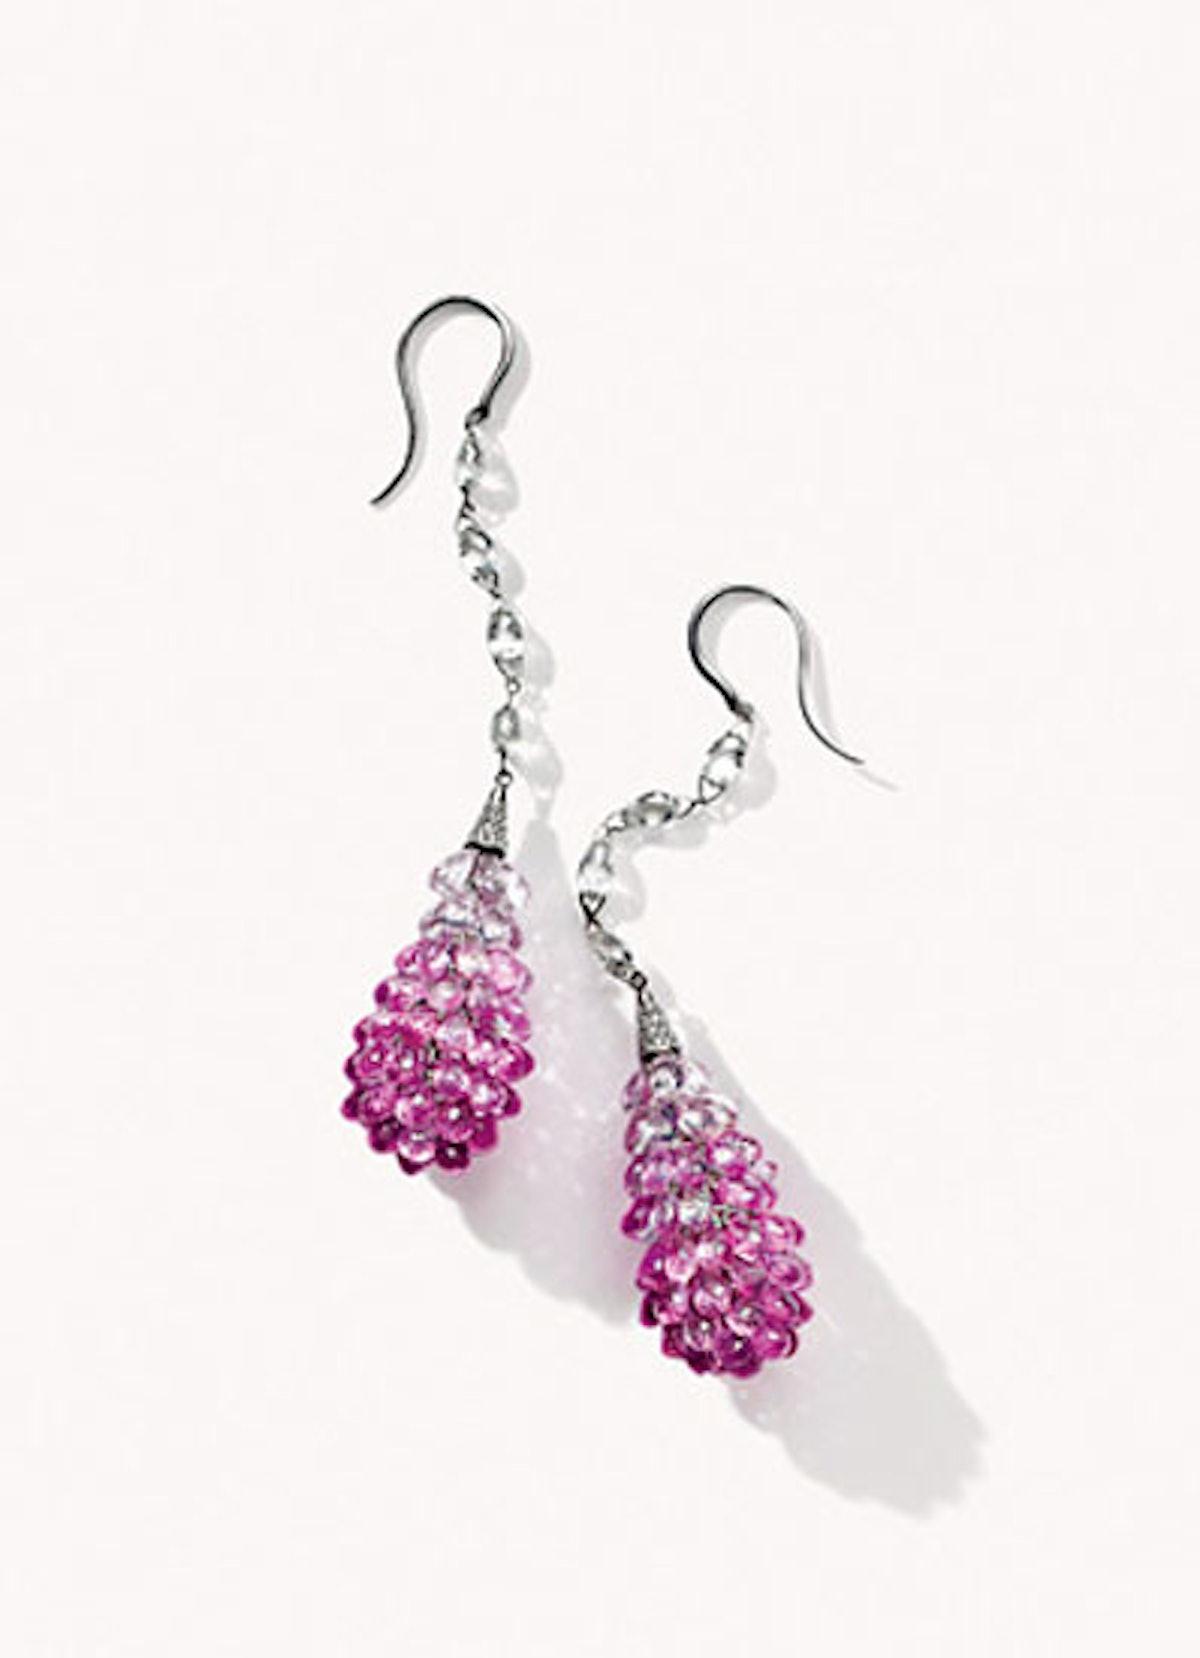 acss-claudia-mata-jewelry-picks-04-v.jpg